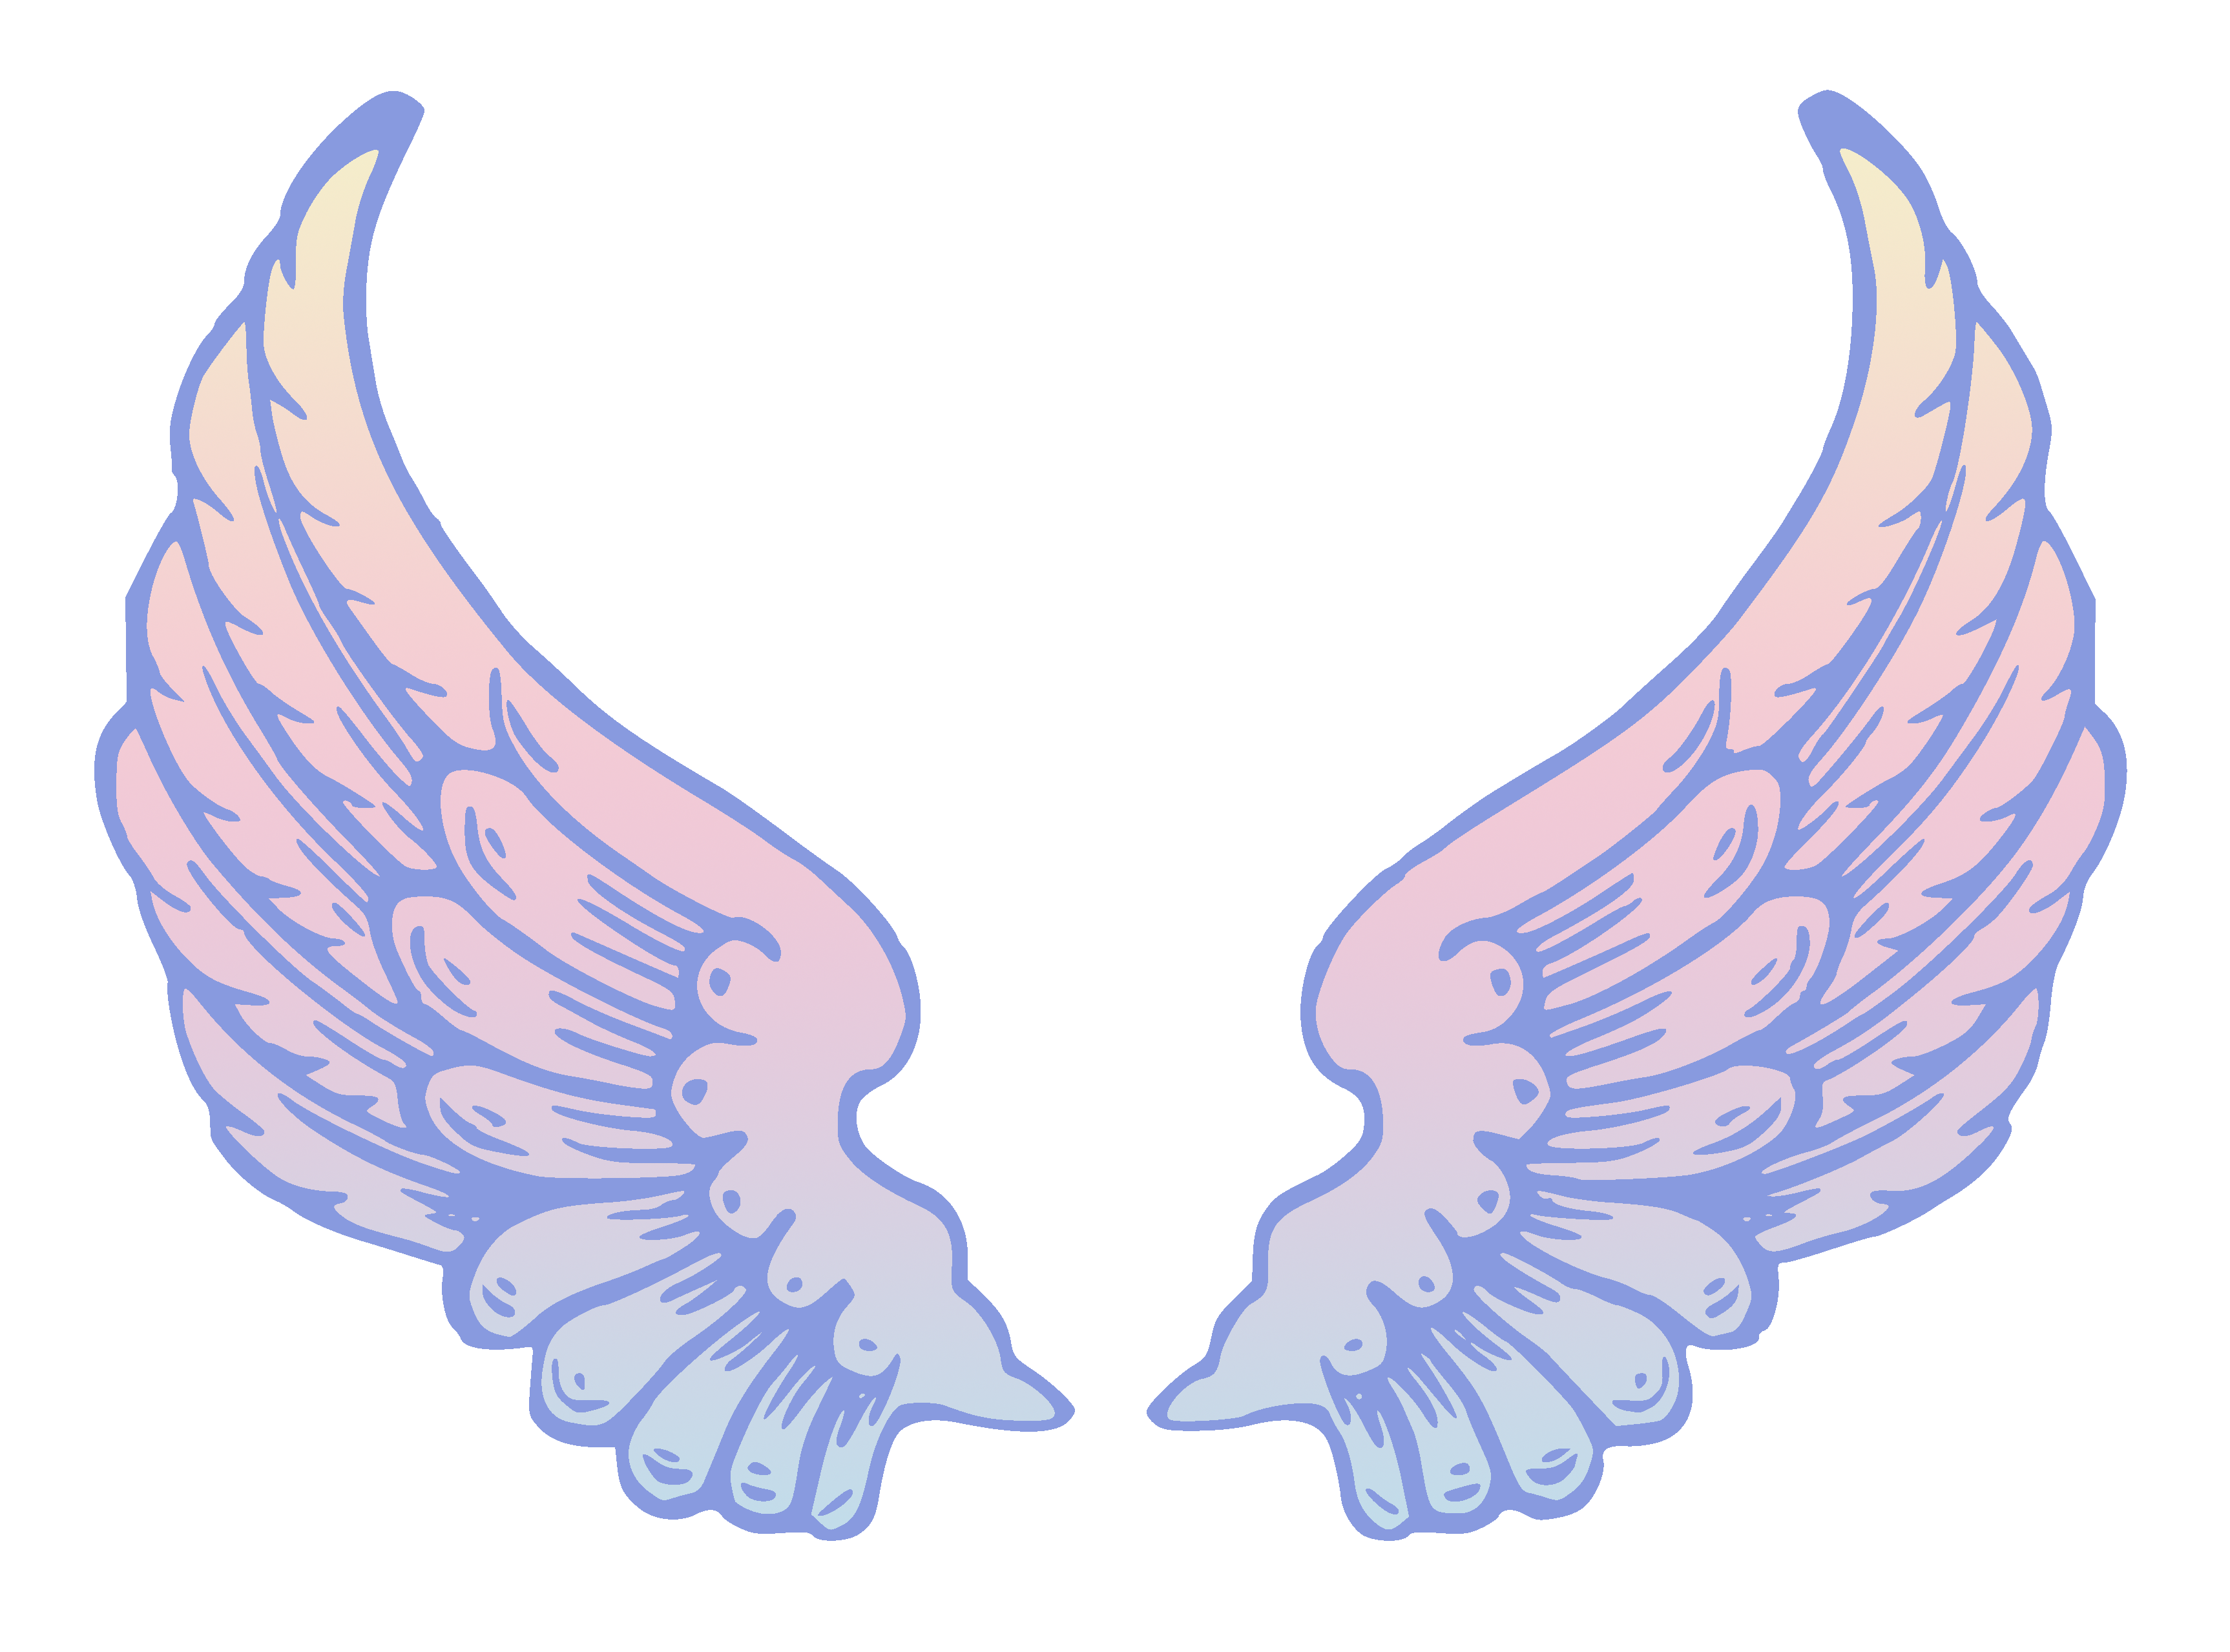 Peterm remix public domain. Angel wings vector png